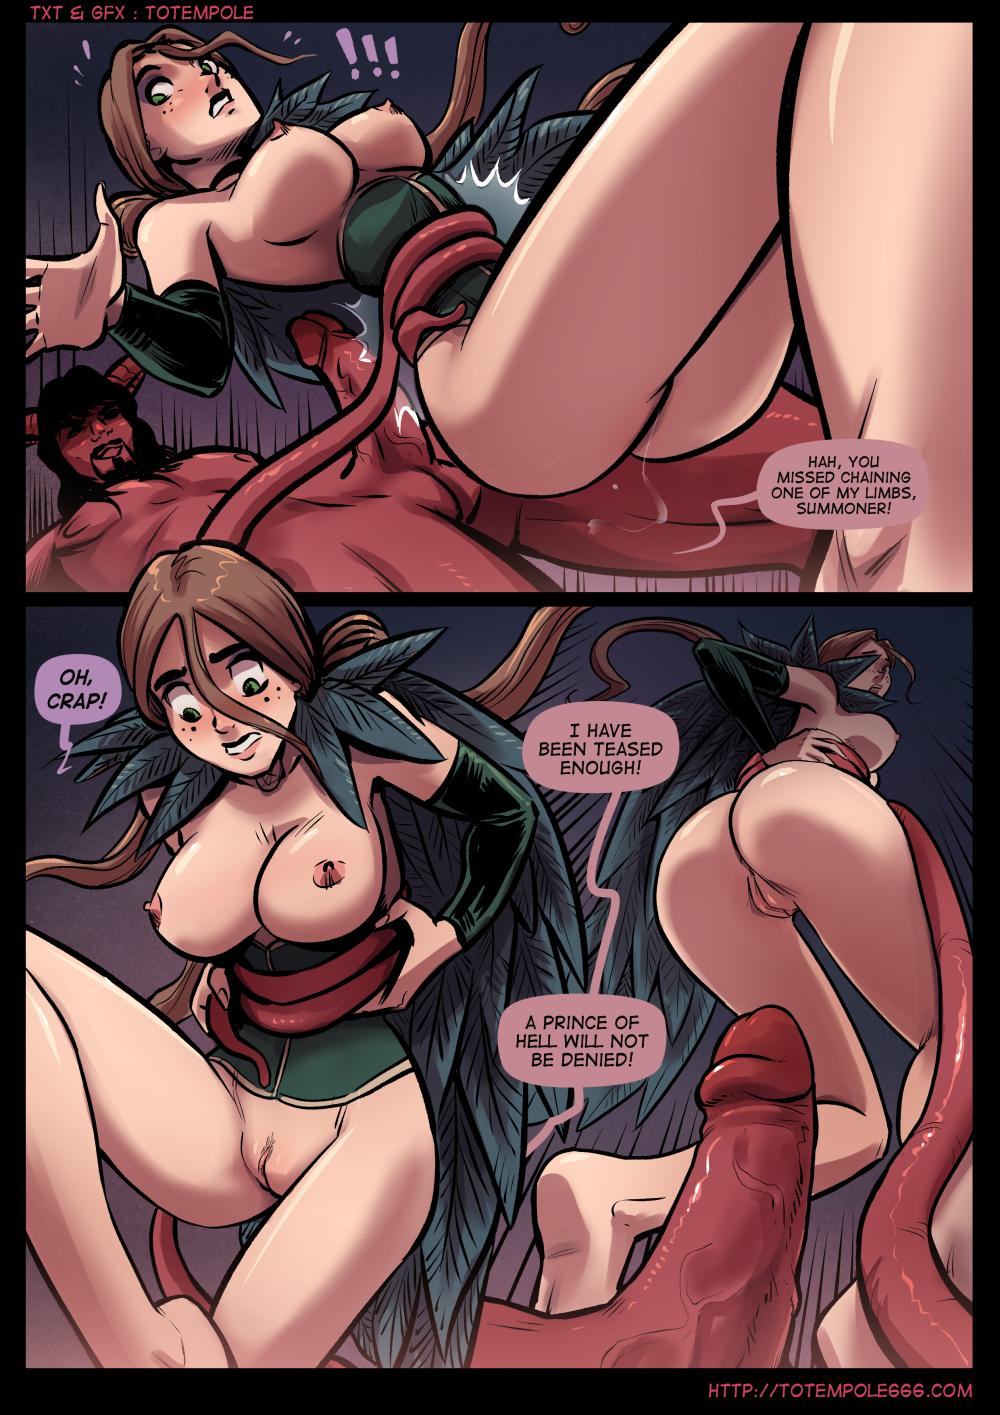 The Second Cumming #23